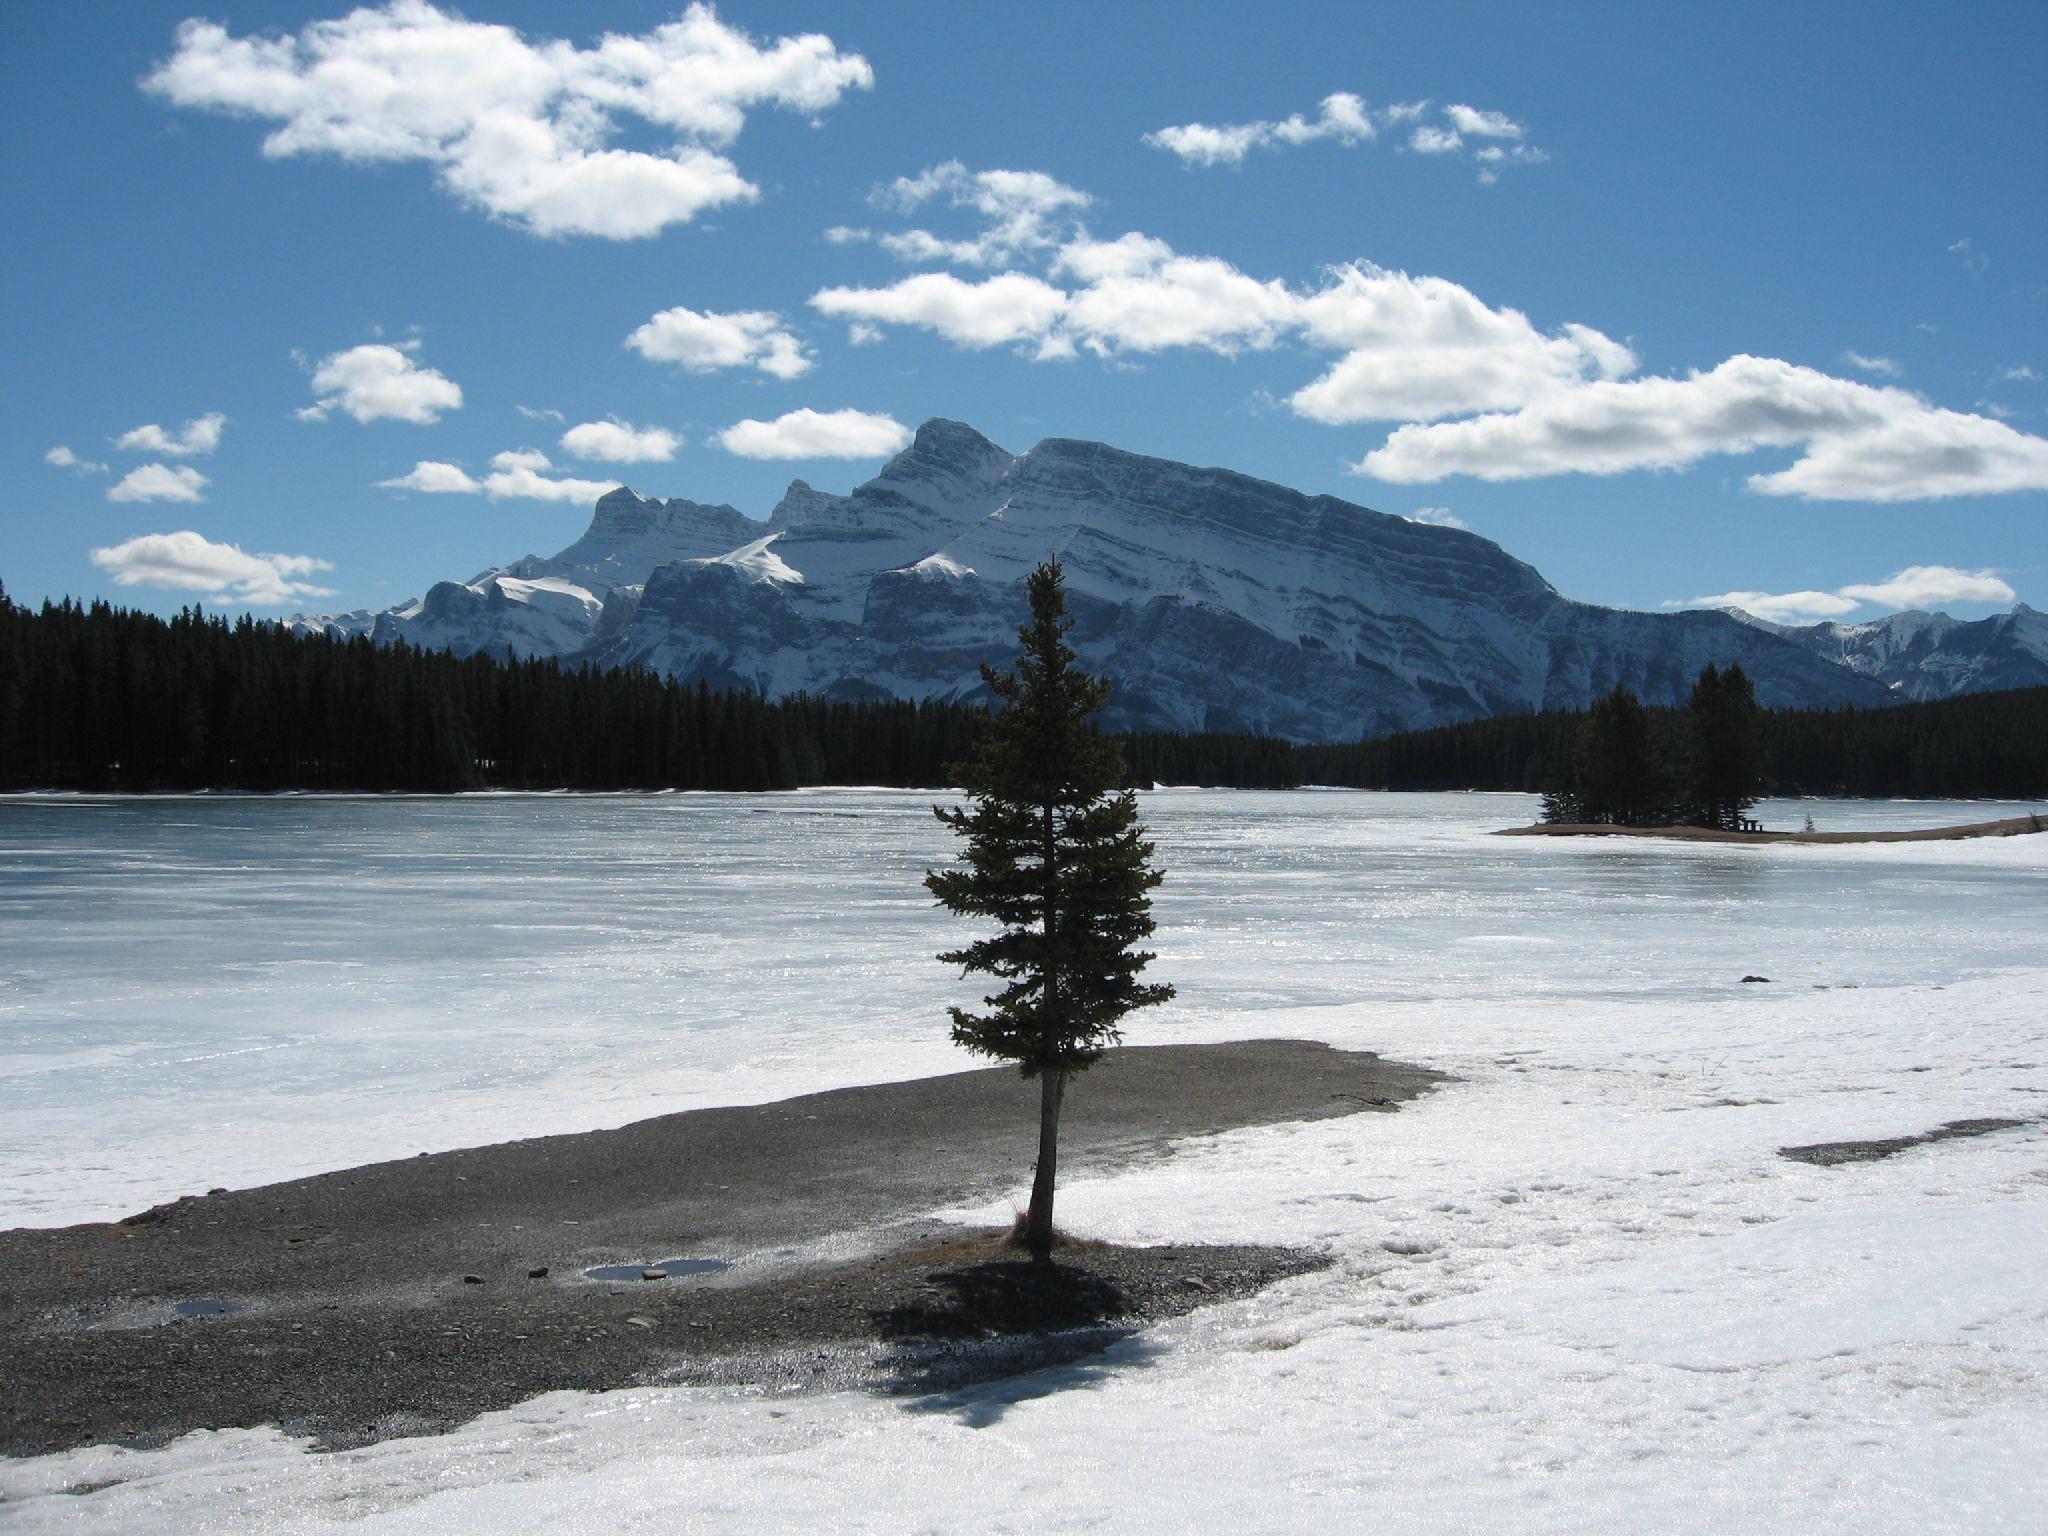 Frozen Lakeside in Banff, Banff Mt Norquay